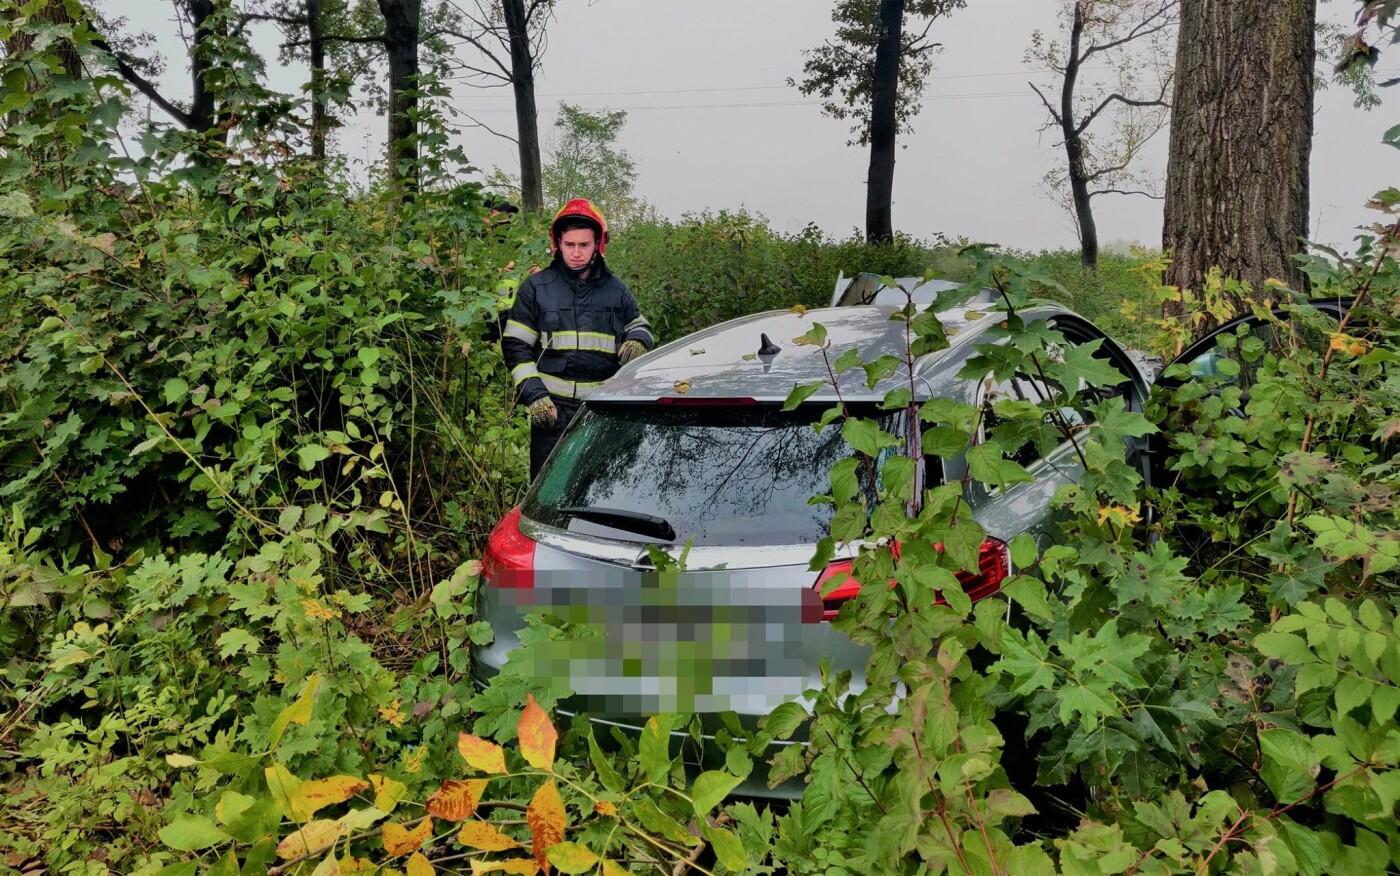 Поблизу села Оринин сталась дорожньо-транспортна пригода, фото-5, Фото: ГУ ДСНС України у Хмельницькій області